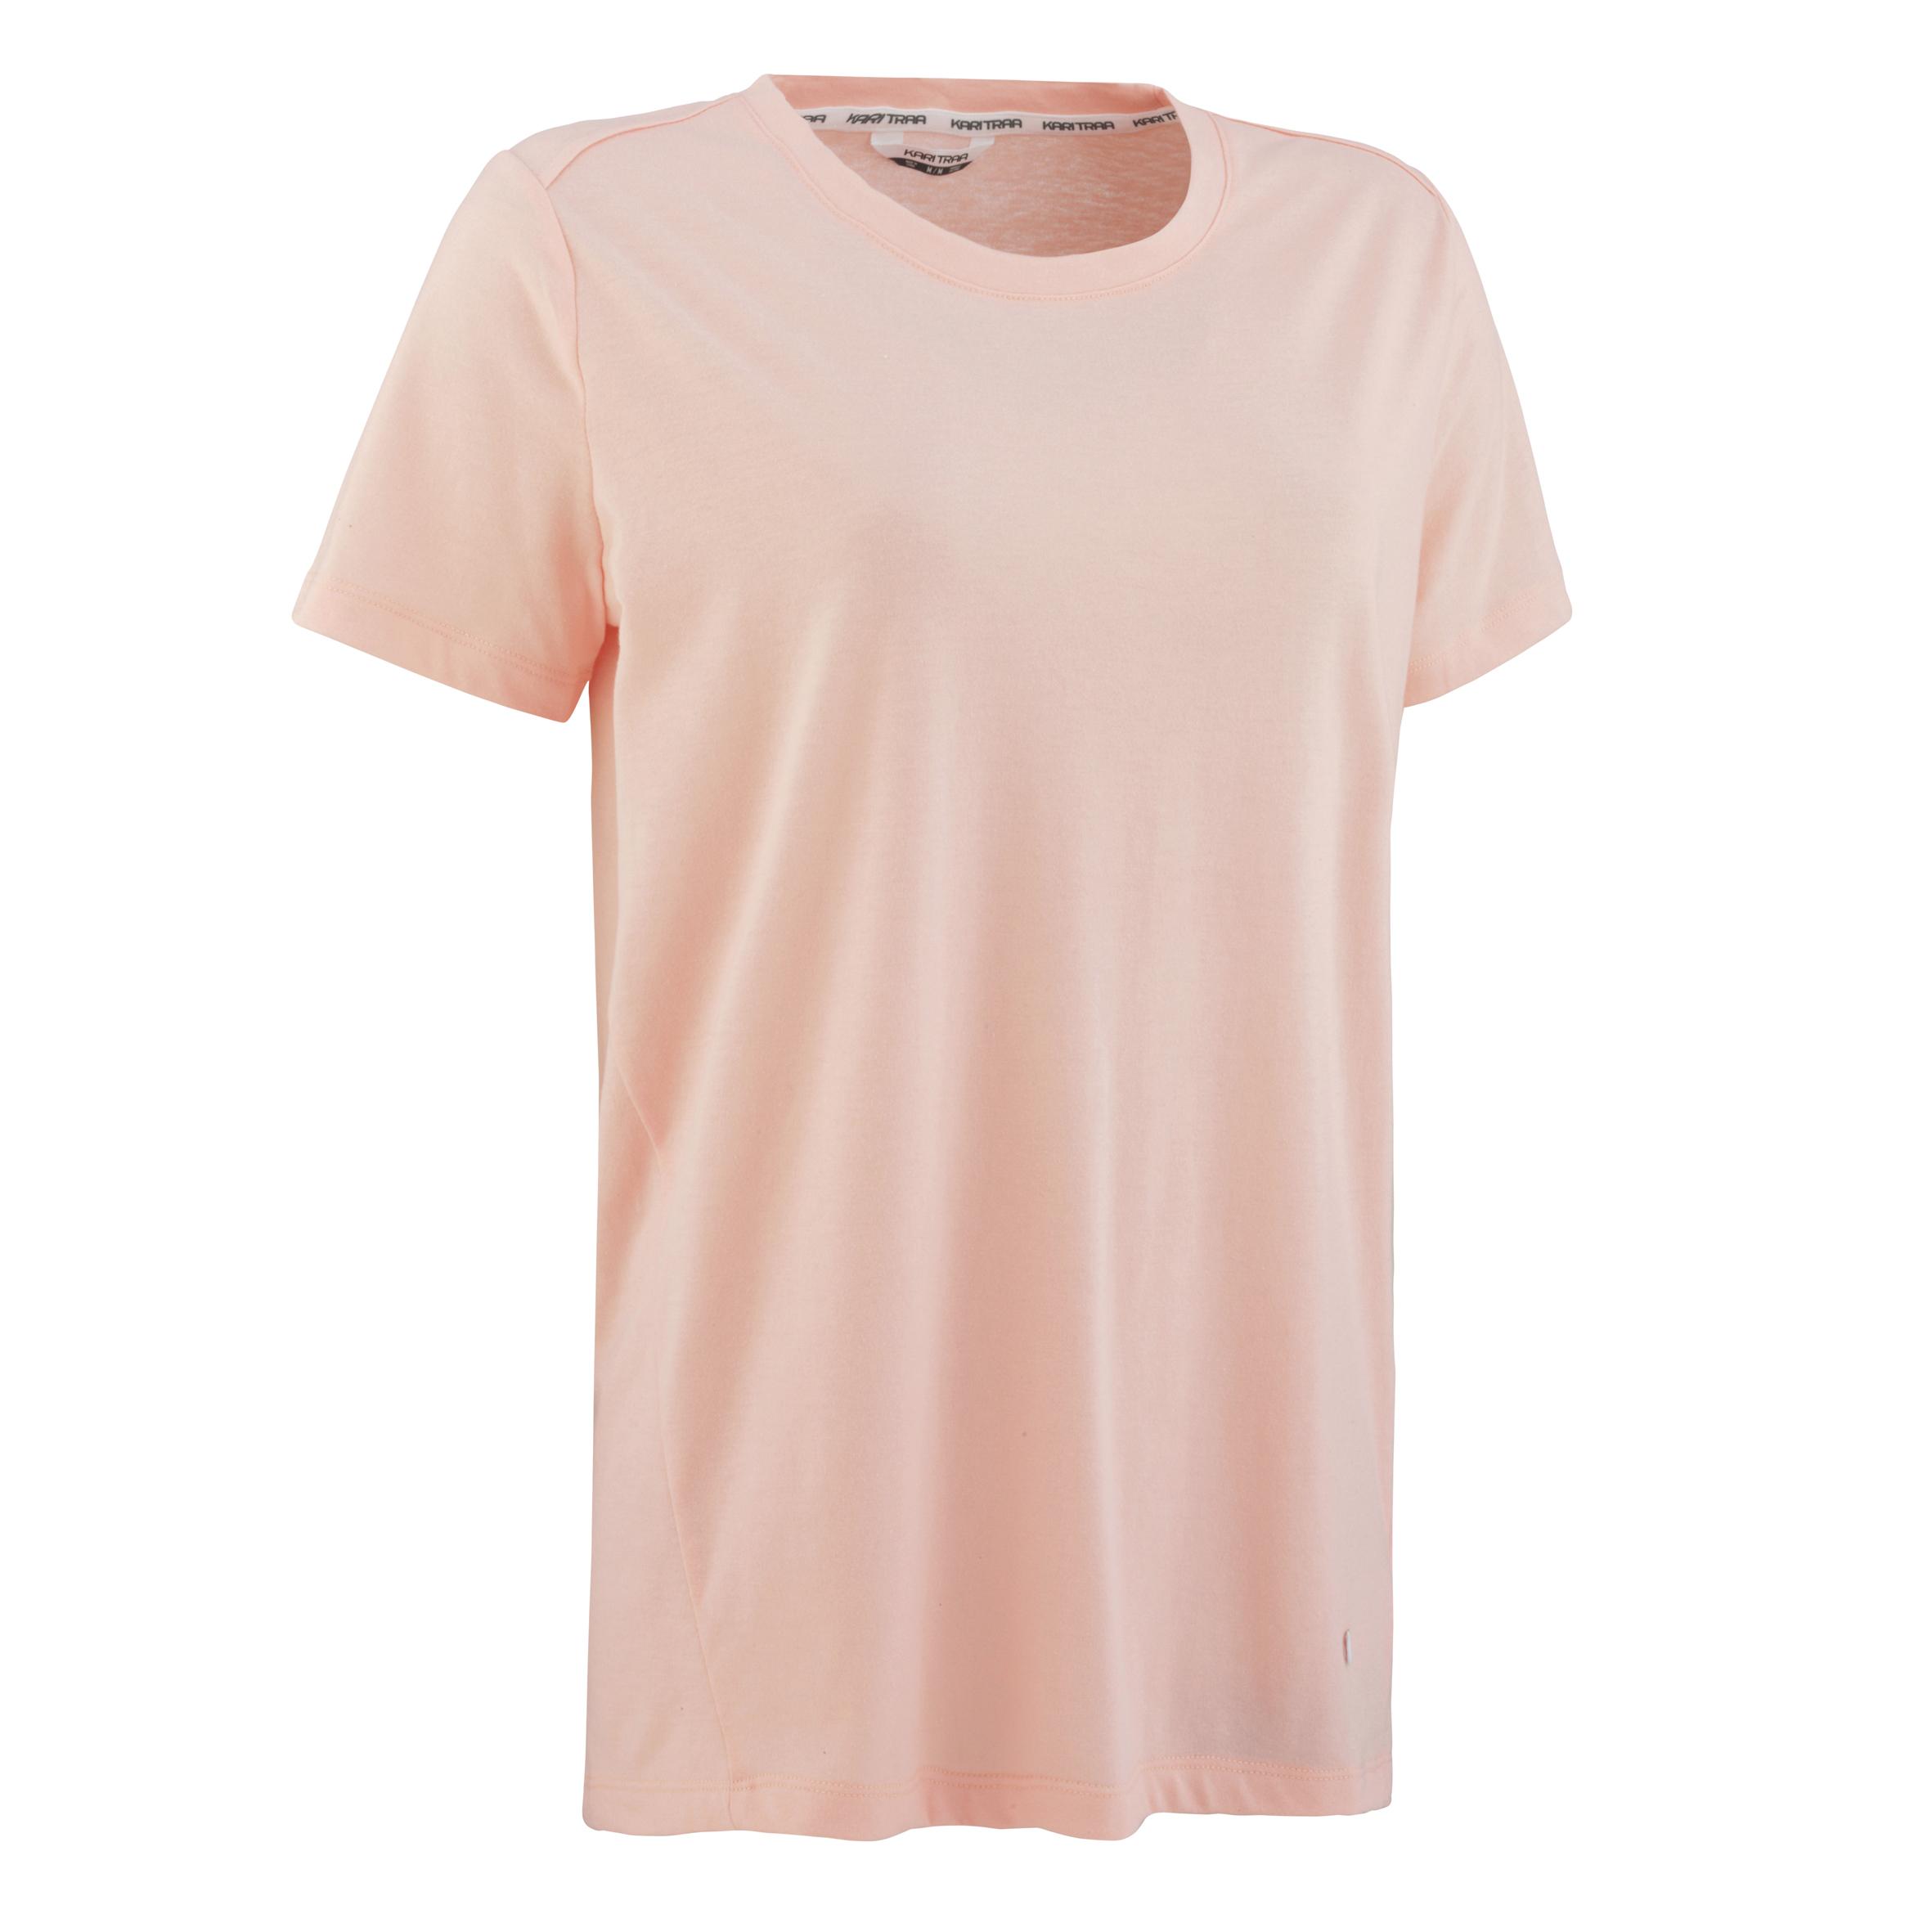 Kari Traa Hau t-shirt